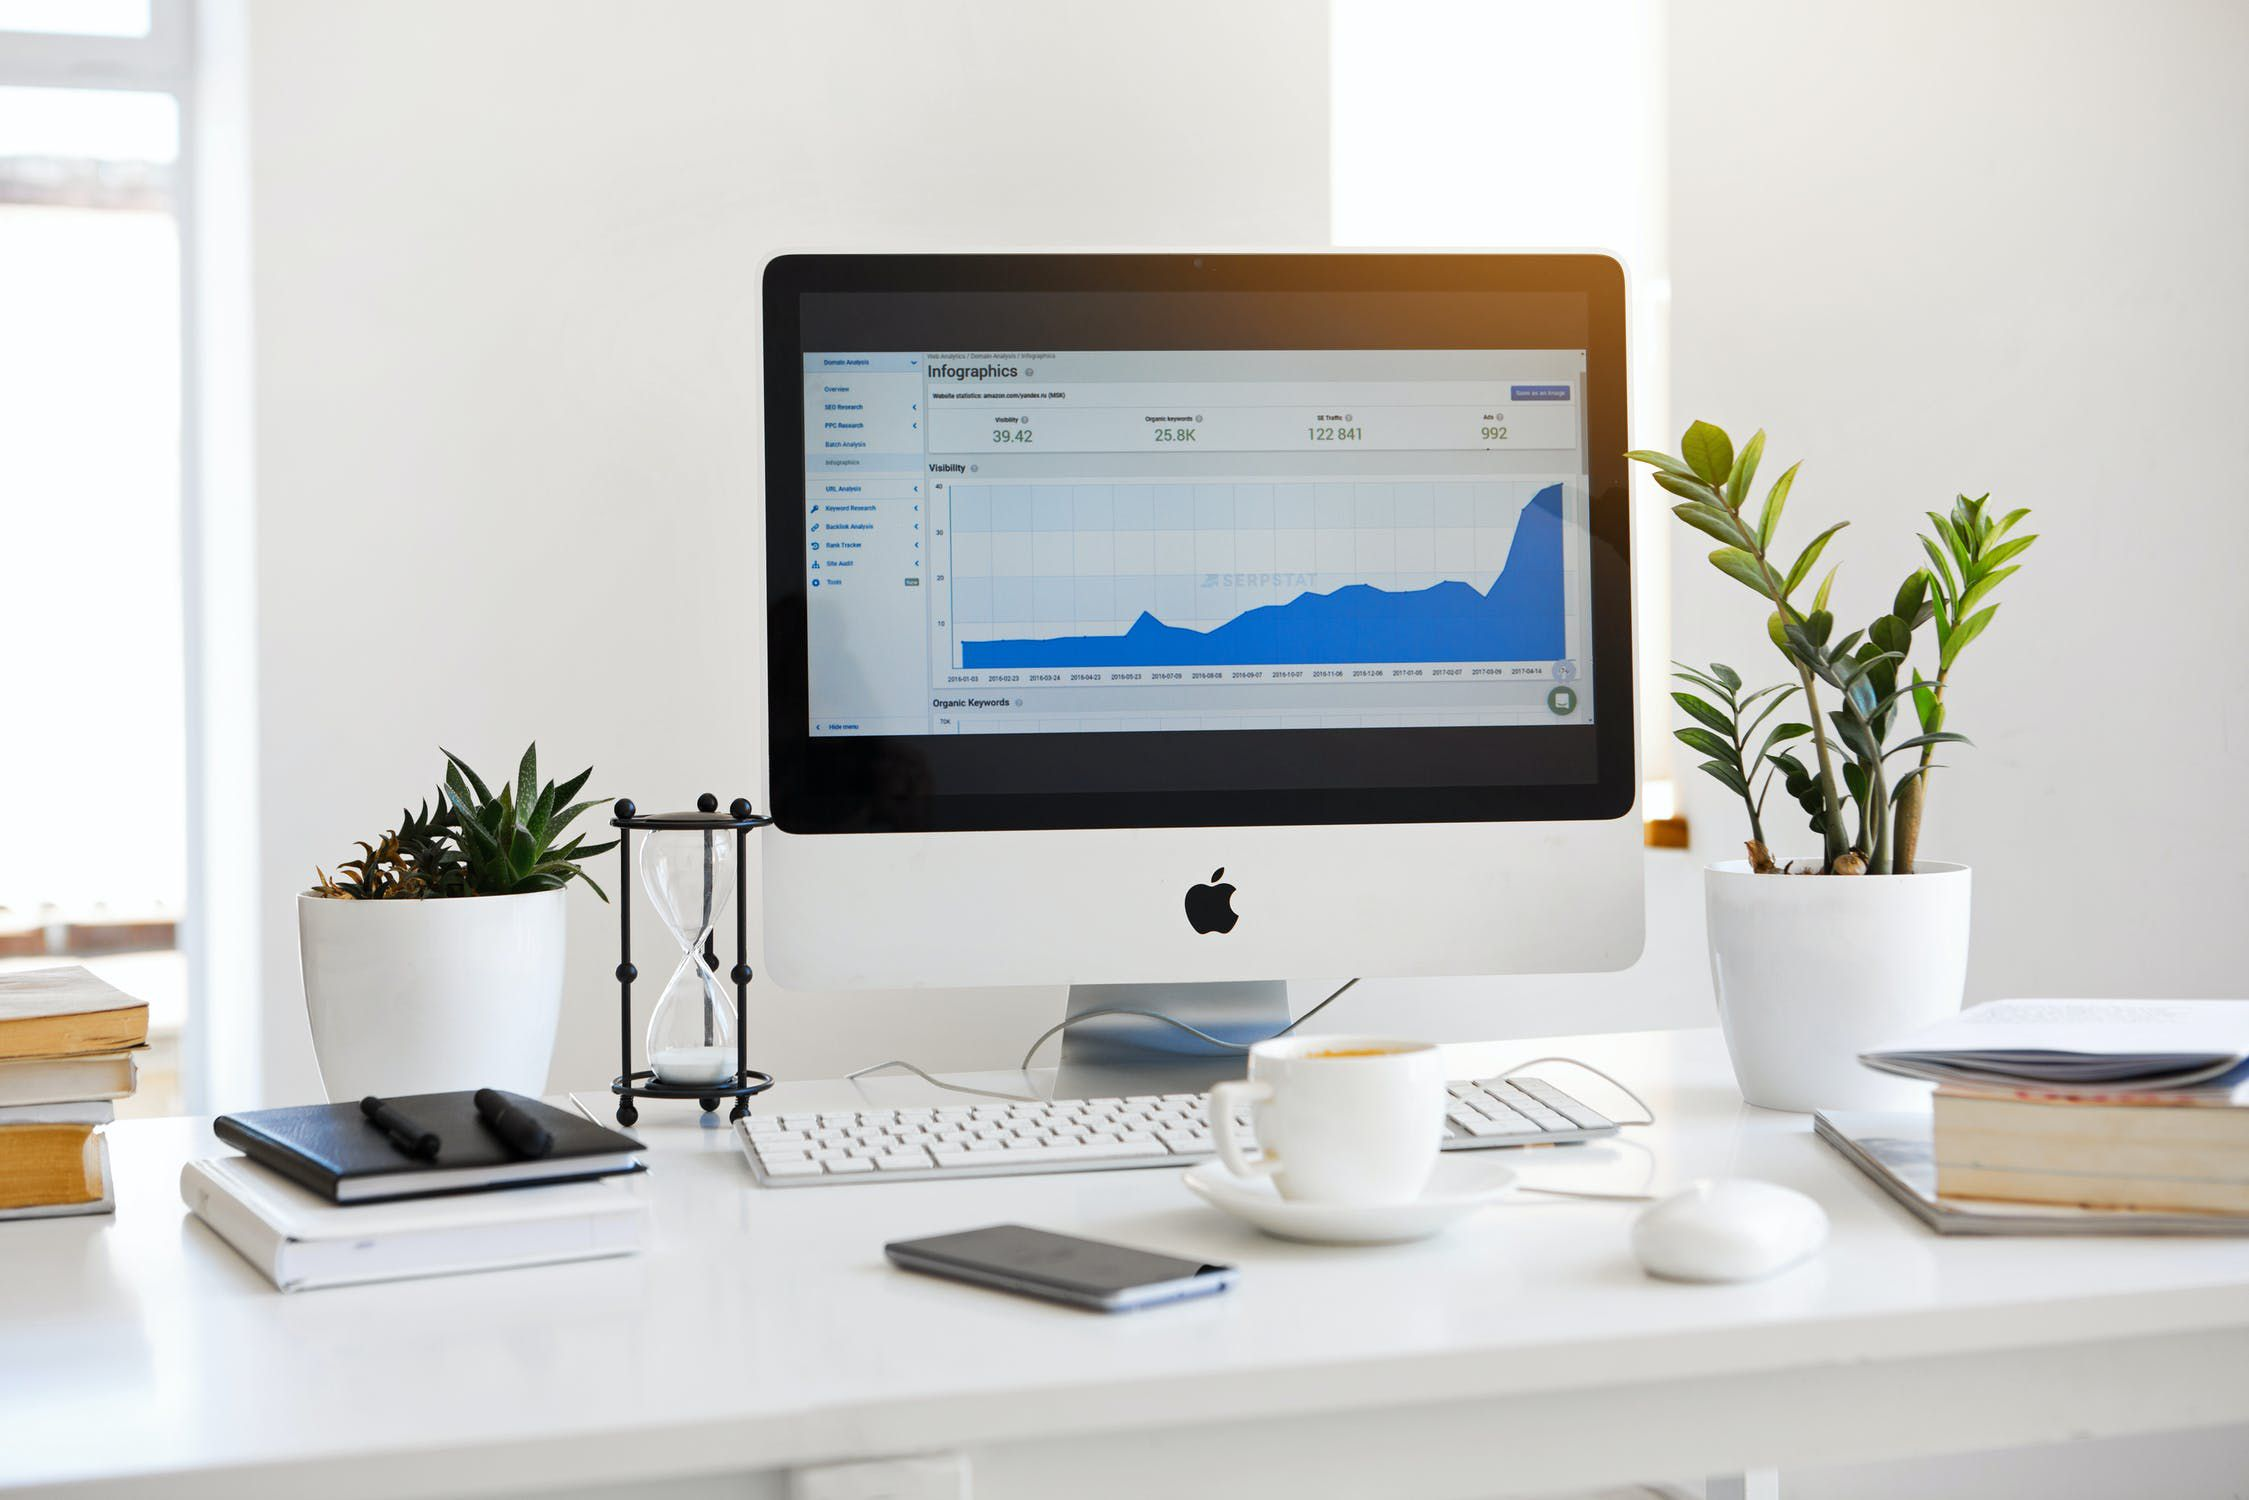 igital marketing analytics on a monitor